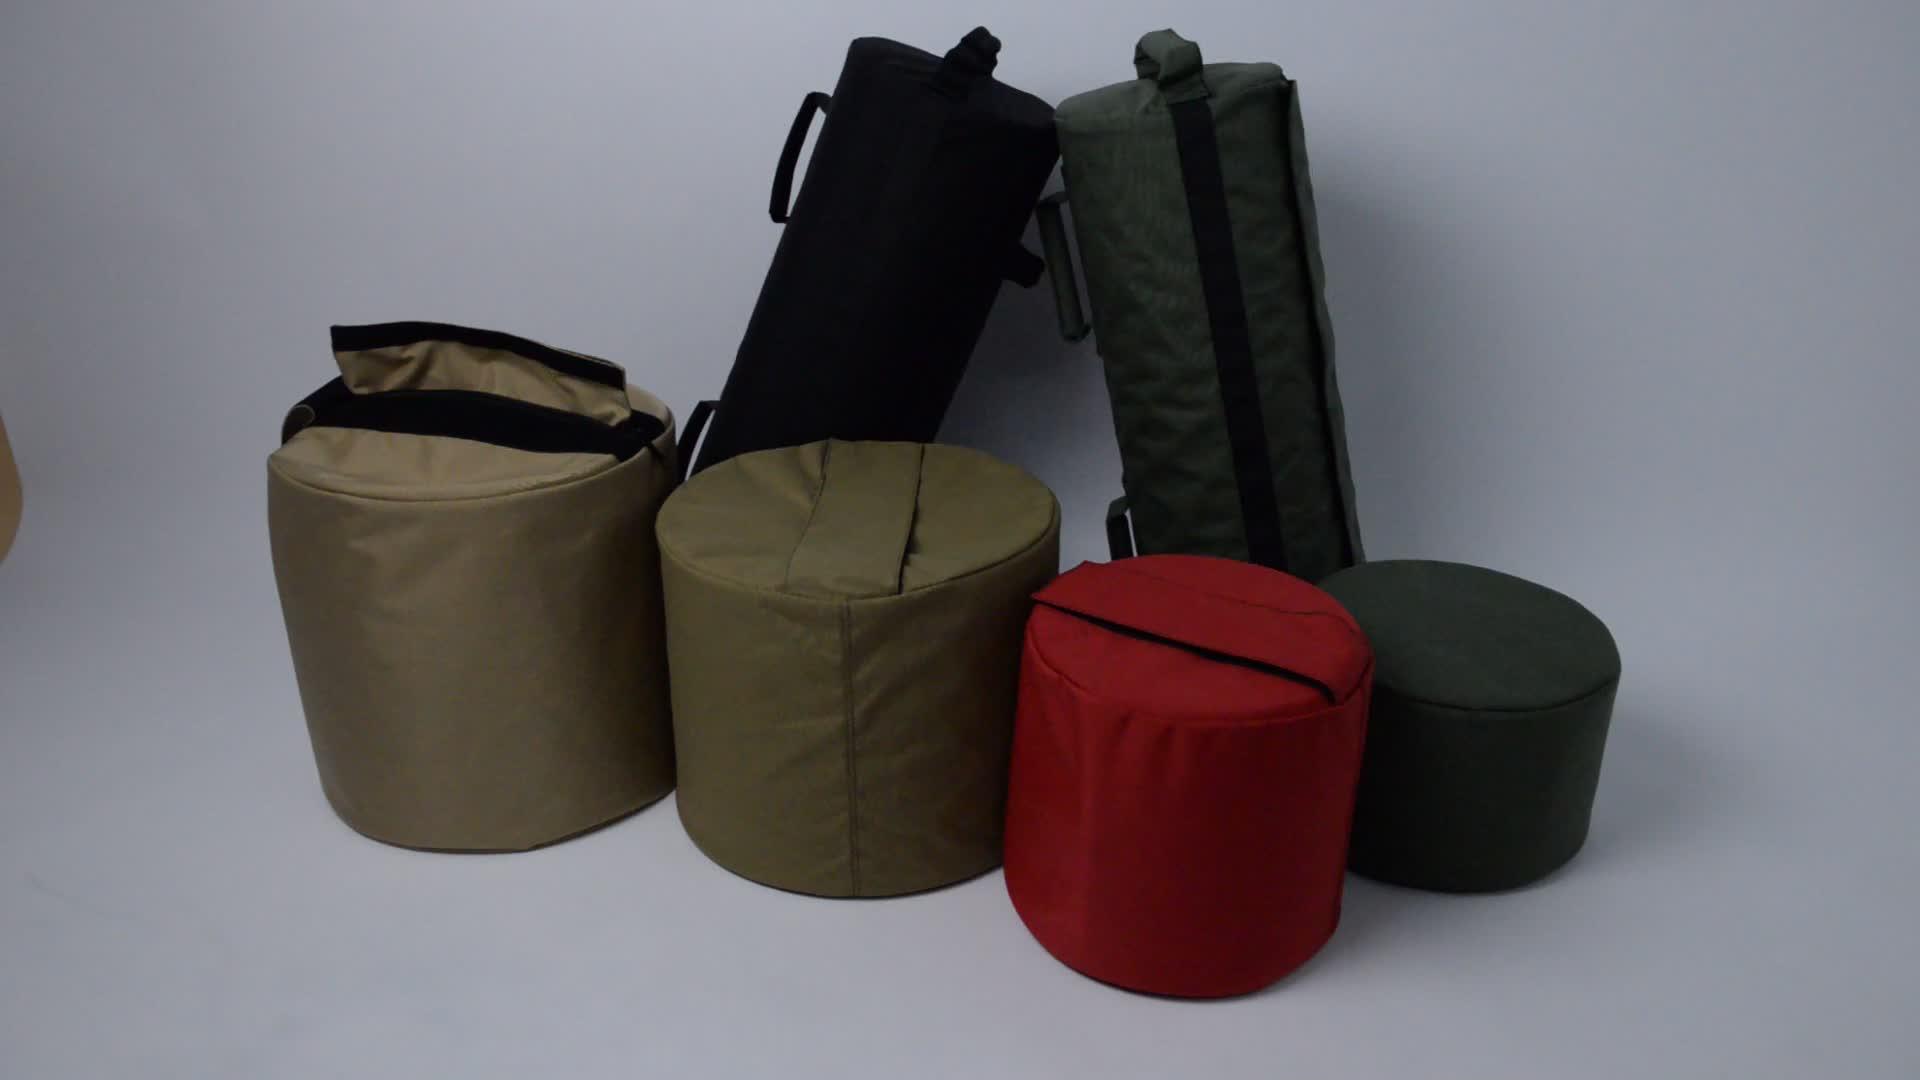 50lbs 70lbs 100lbs 150lbs 200lbs 강한 남자 훈련 지퍼 sandbags